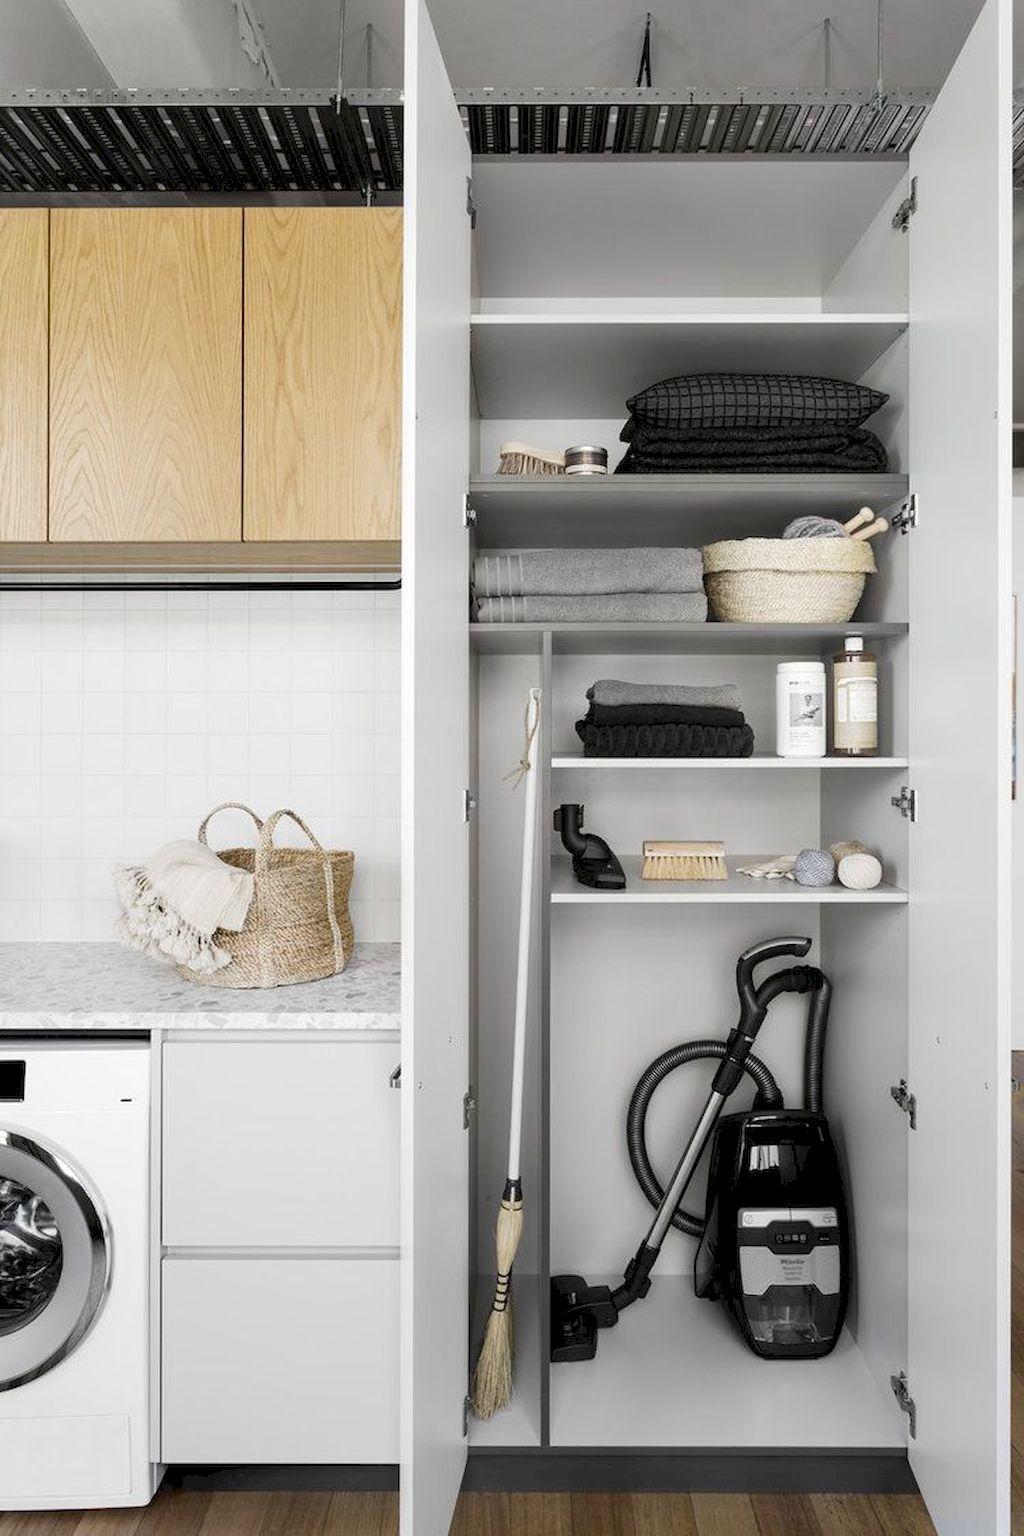 65 Genius Laundry Room Storage Organization Ideas images